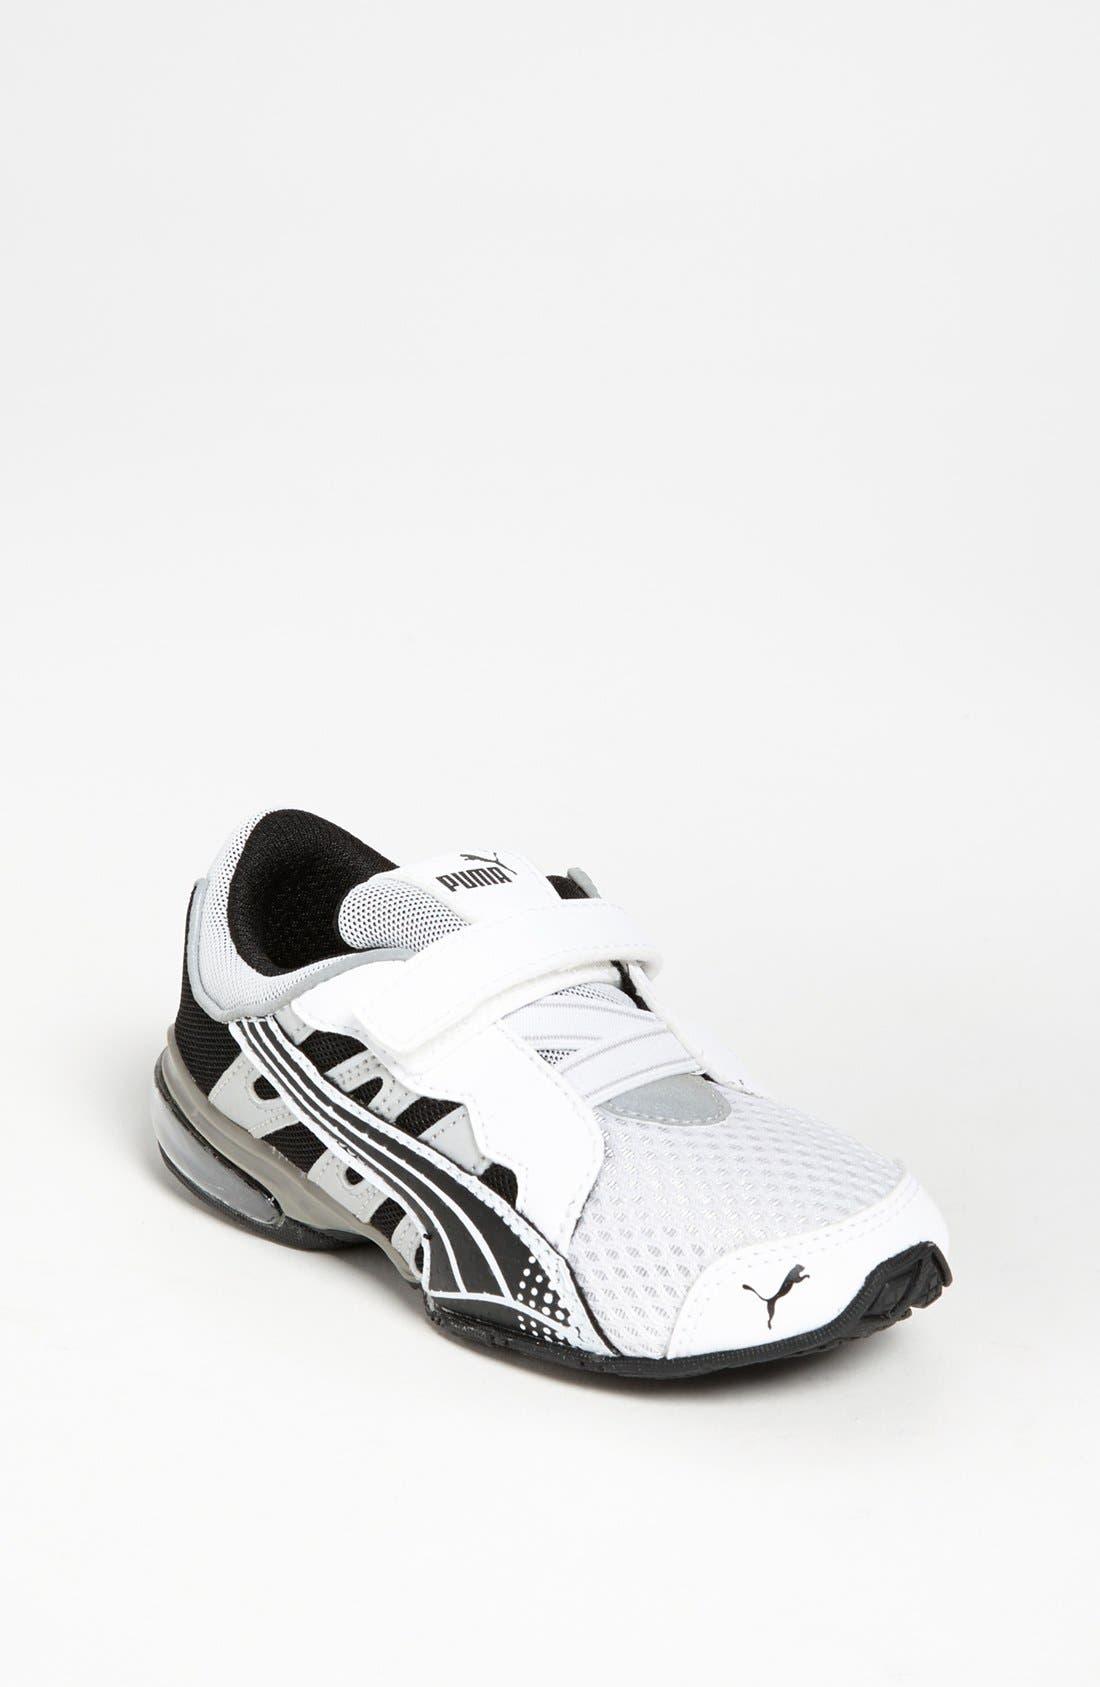 Main Image - PUMA 'Voltaic V' Sneaker (Baby, Walker, Toddler, Little Kid & Big Kid)